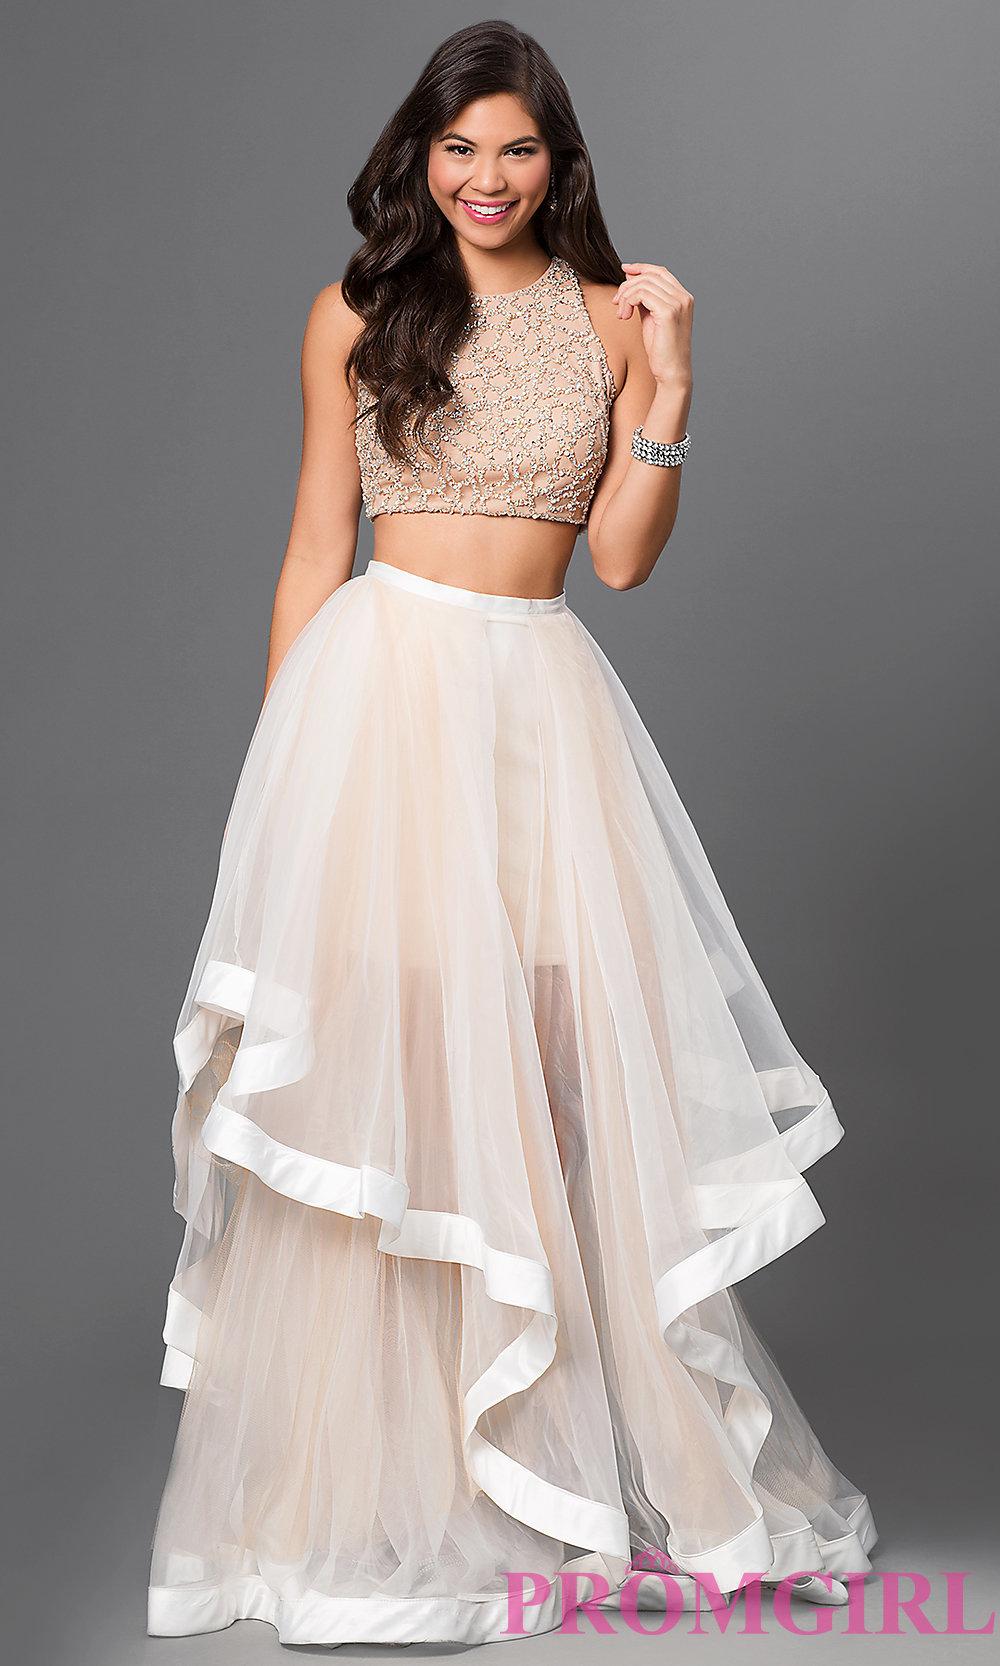 Glamour by Terani Two Piece Dress with Jeweled Bodice